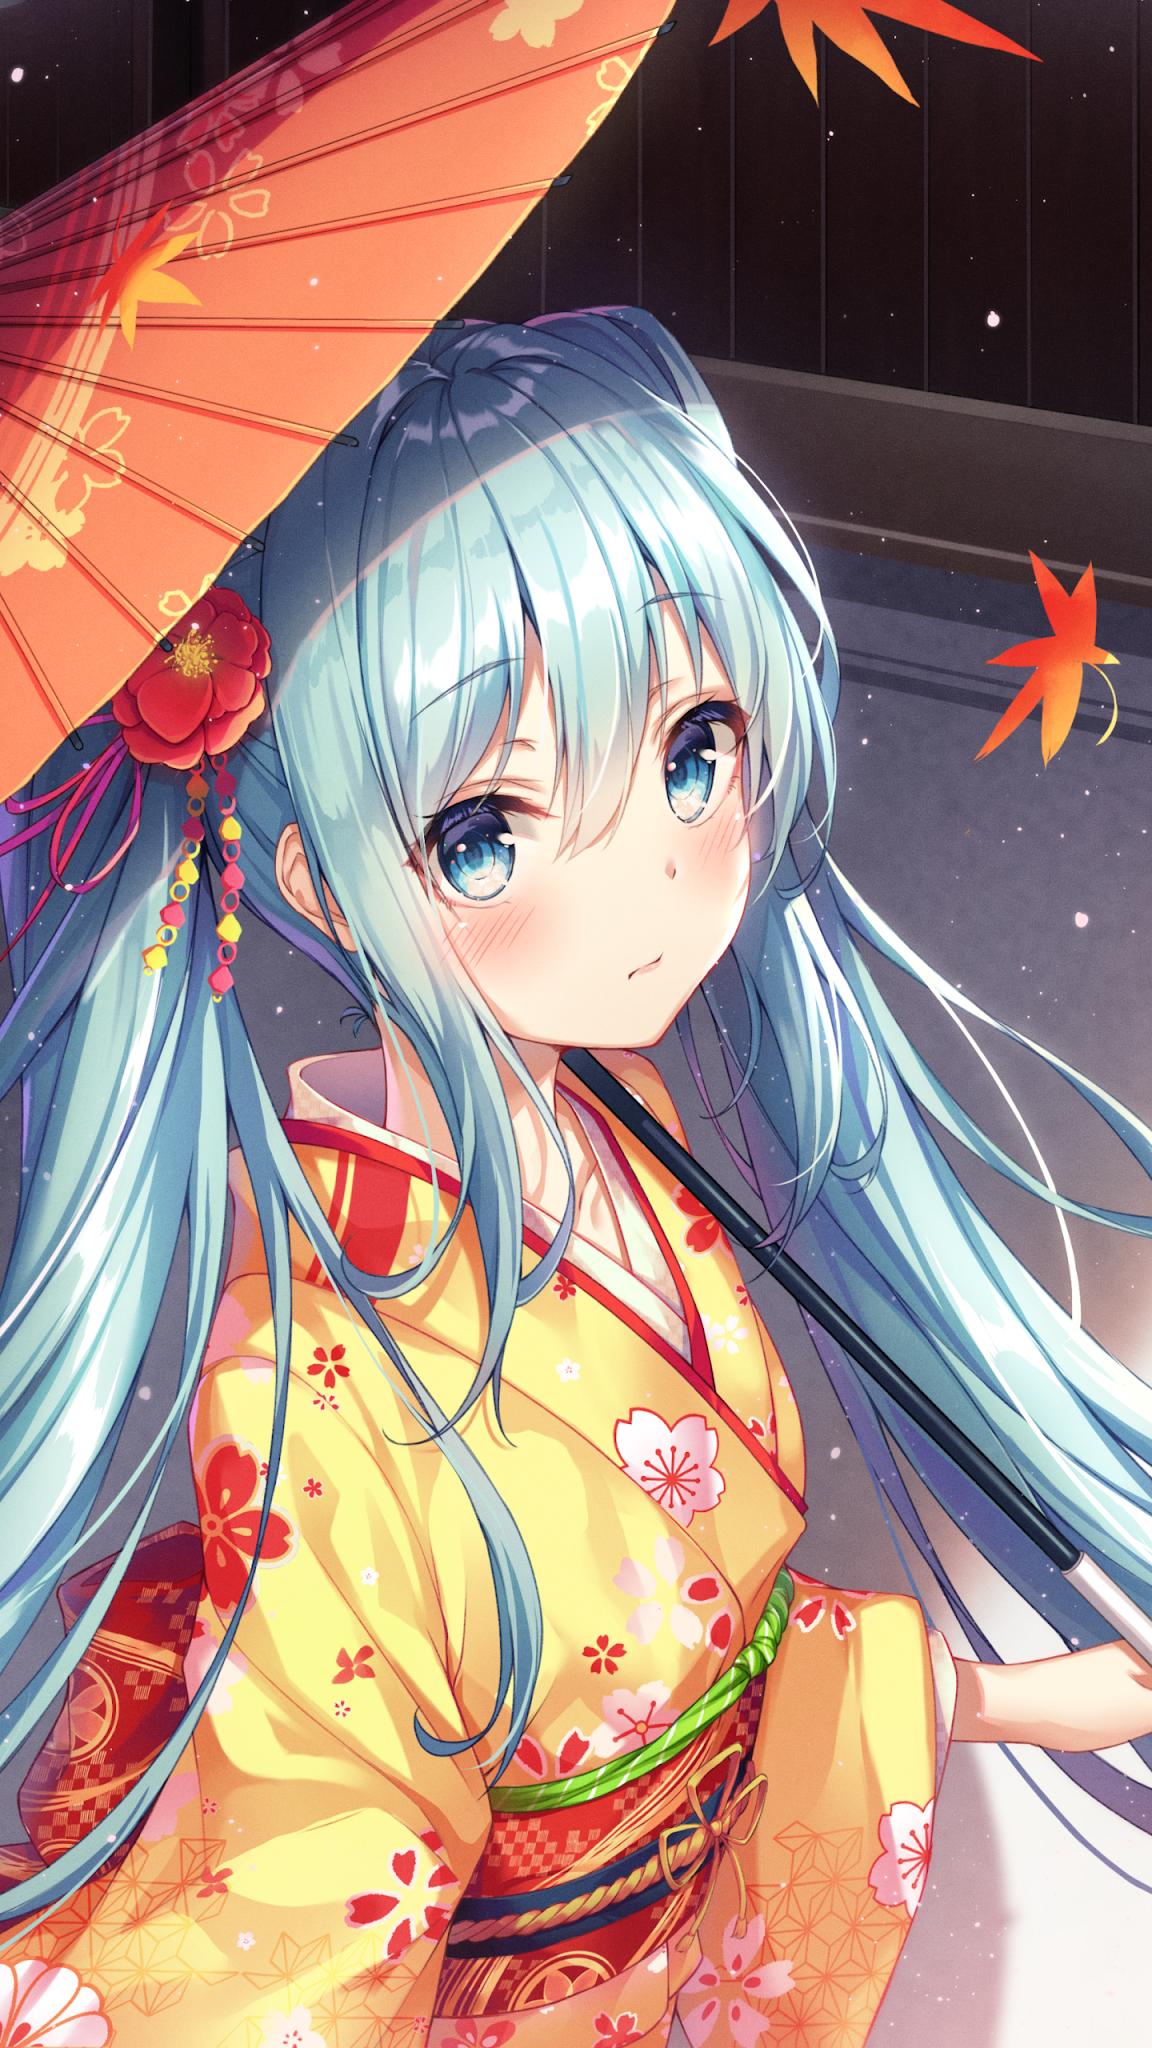 Hatsune Miku Anime Mobile Wallpaper Vocaloid Anime Wallpaper Iphone Hatsune Miku Anime Wallpaper